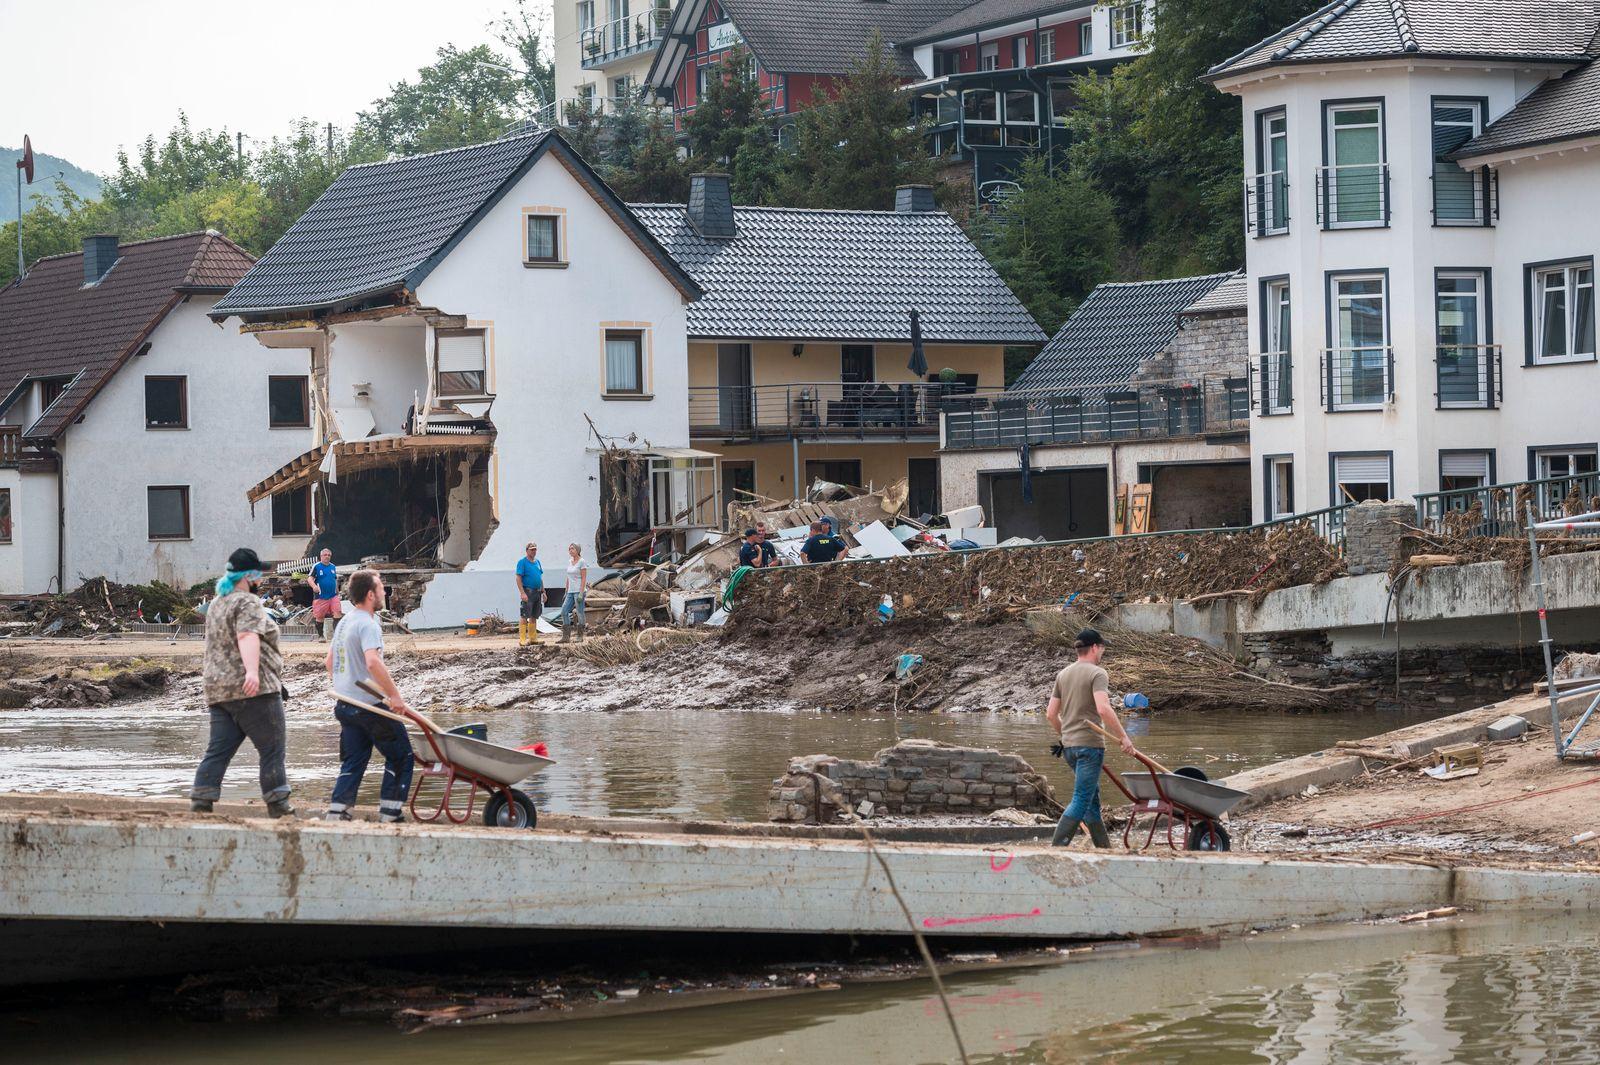 Ahr River Region Following Catastrophic Flooding